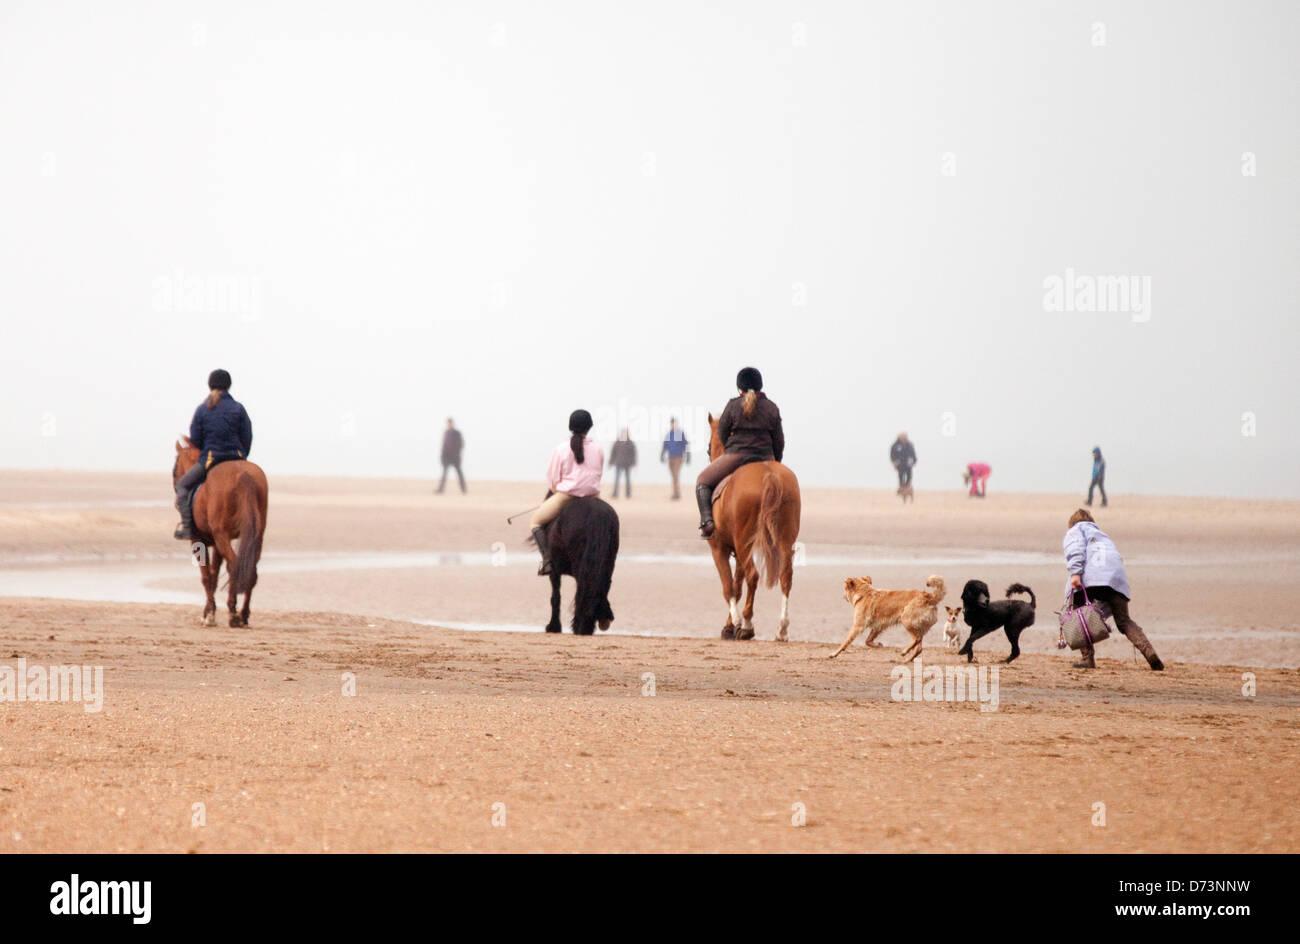 People walking, riding horses and walking dogs, Holkham beach, Norfolk, East Anglia England UK Stock Photo